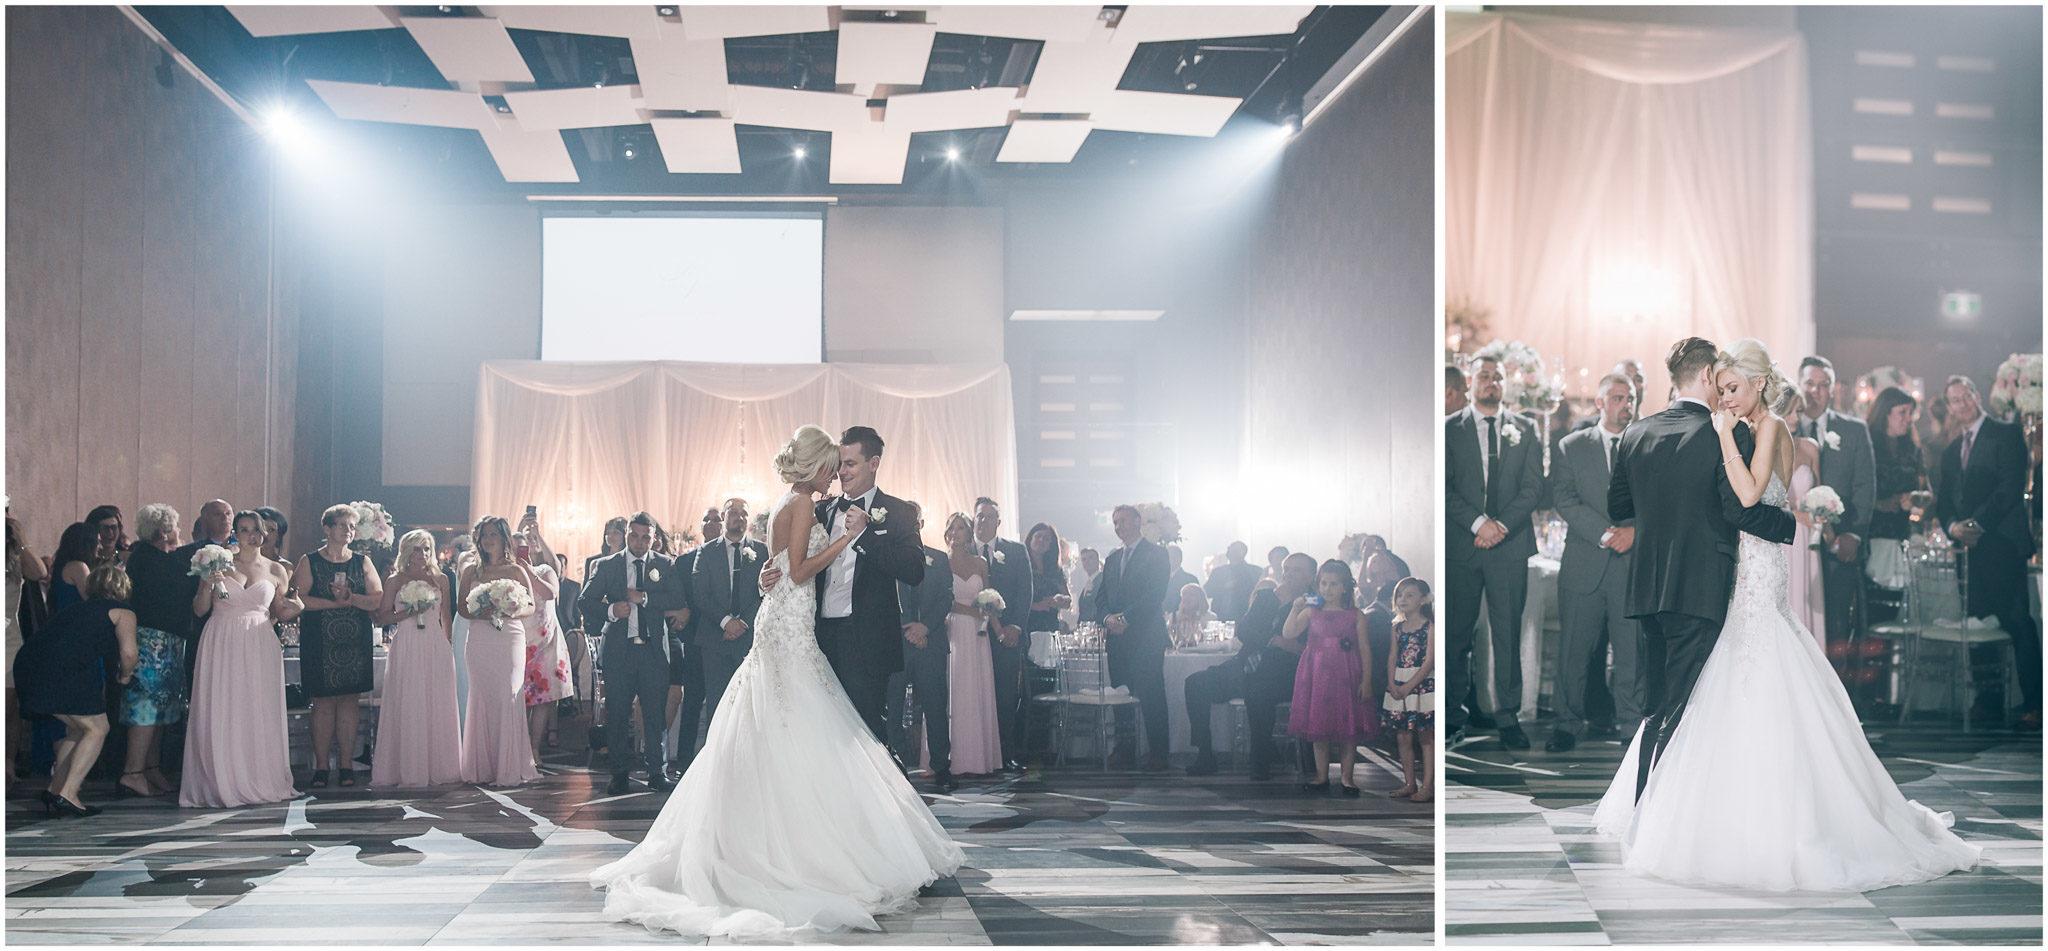 wedding-reception-universal-event-space-3